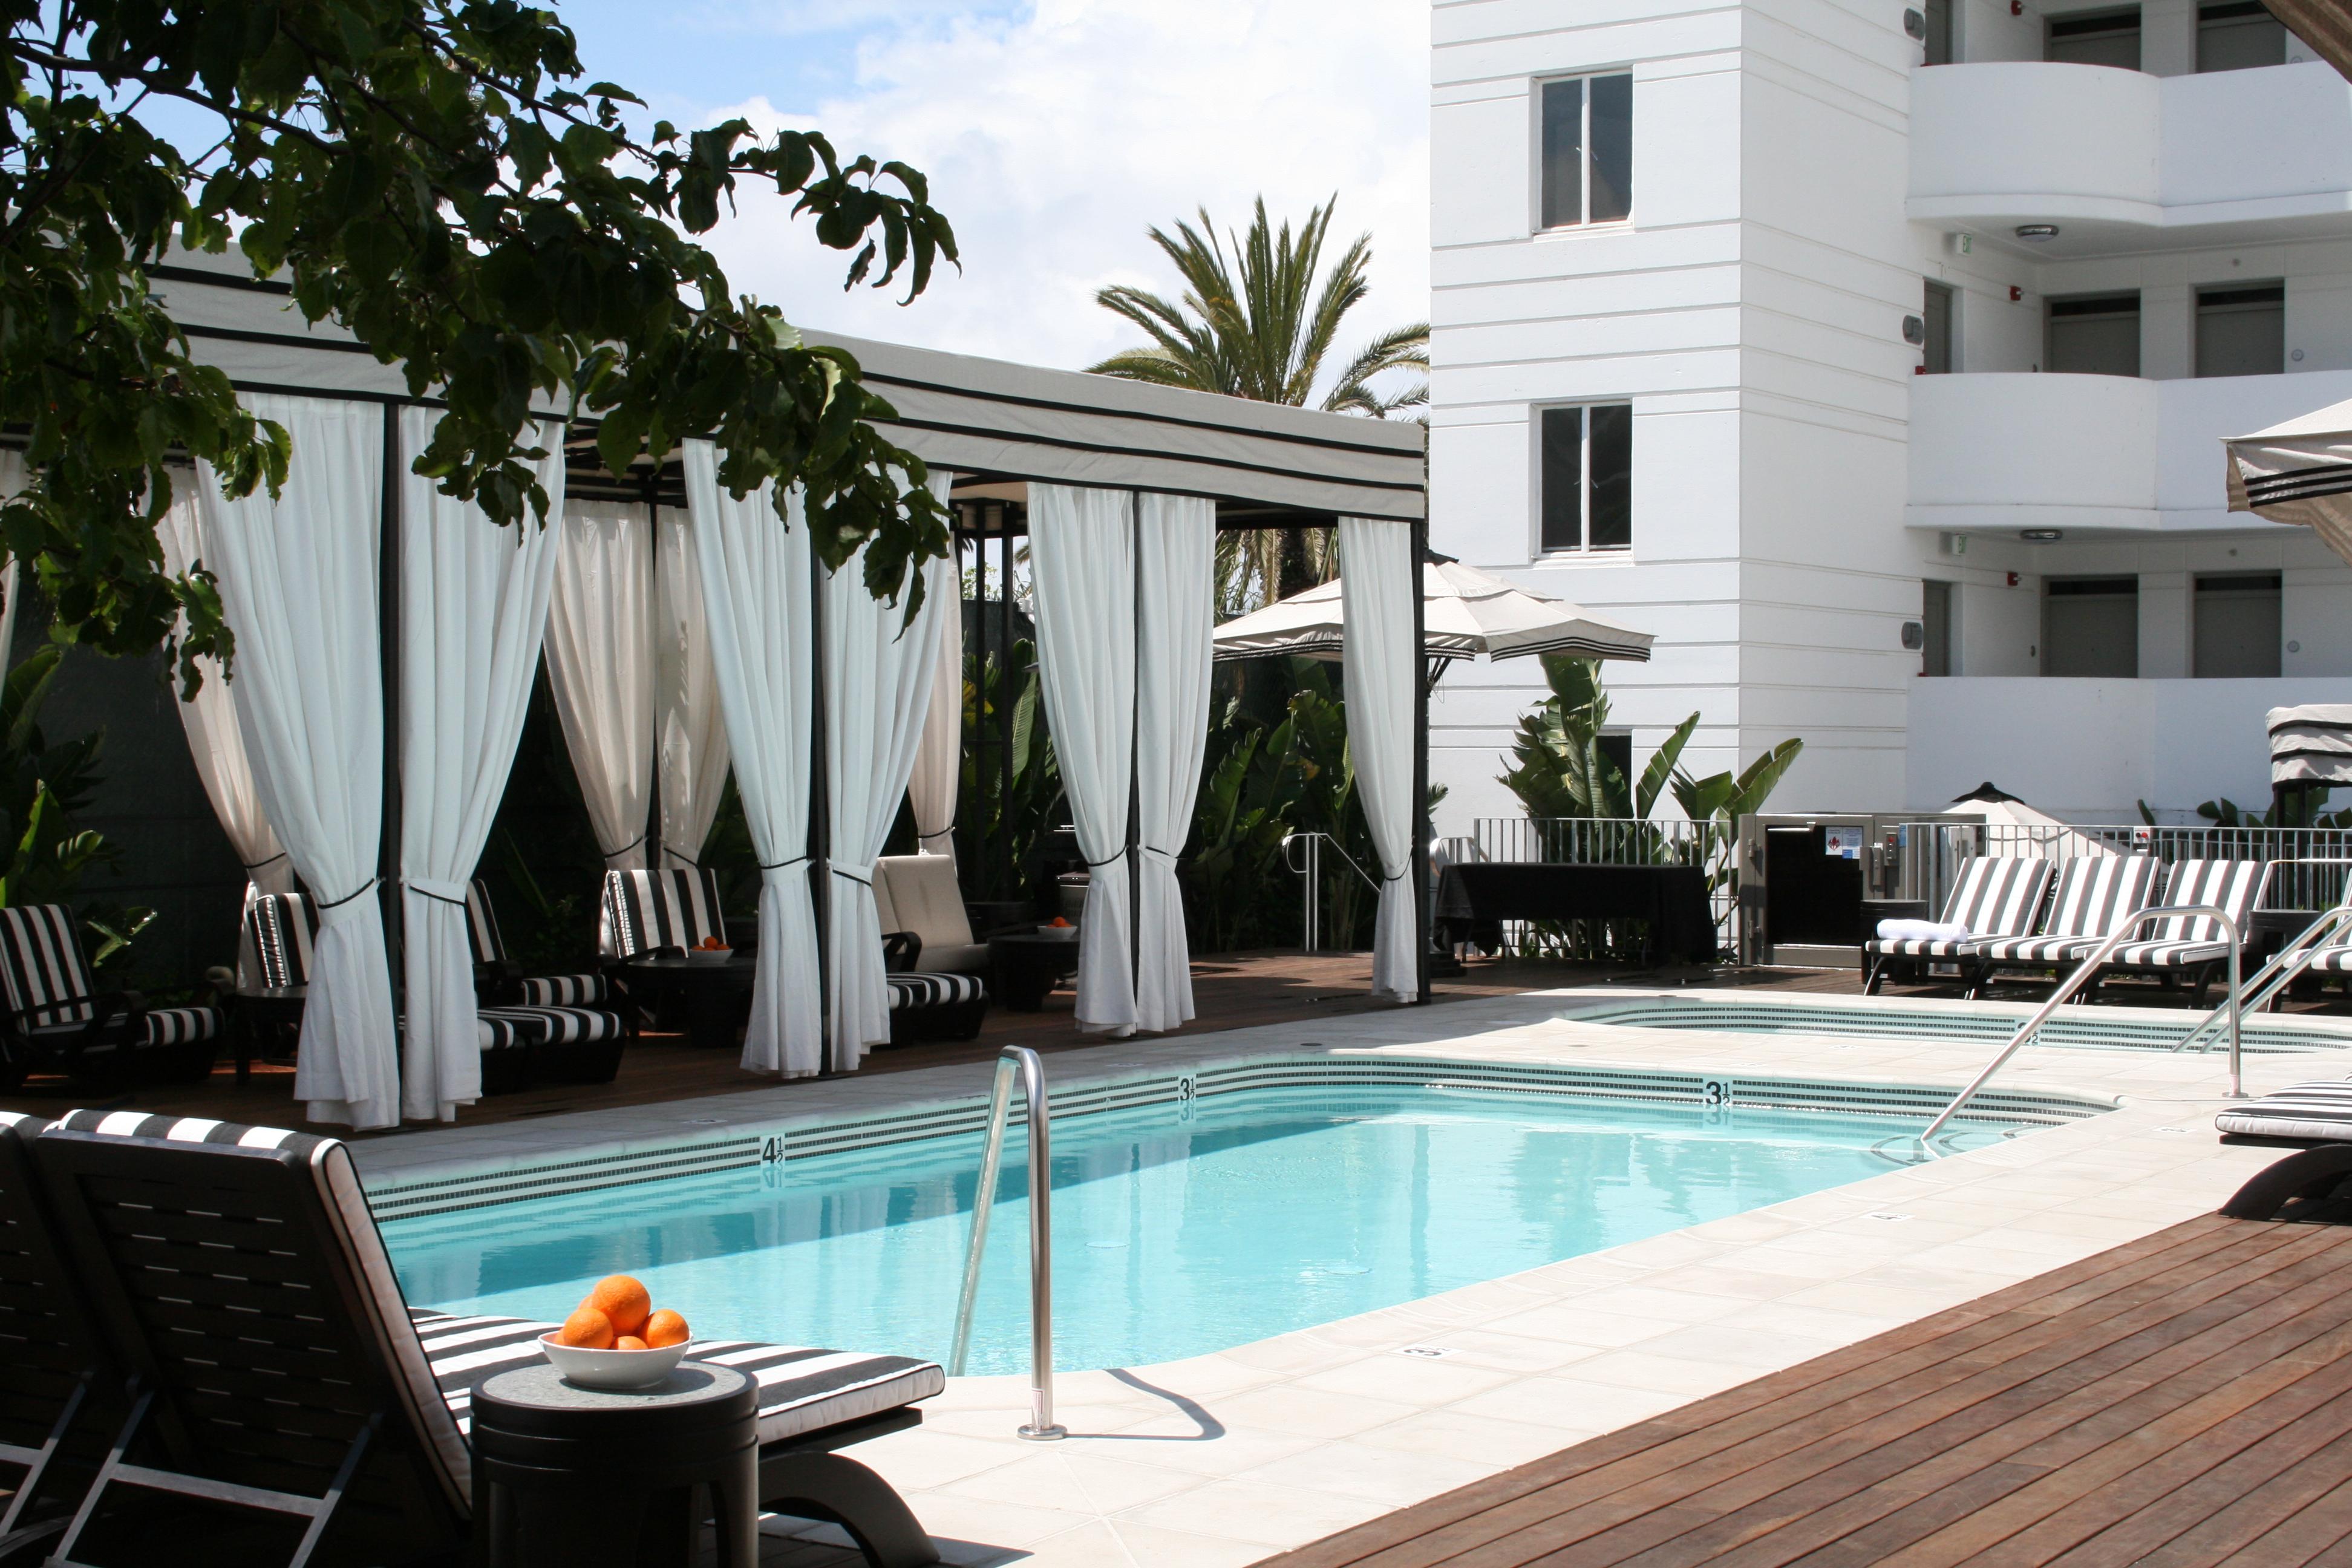 4 Cabanas and Pool